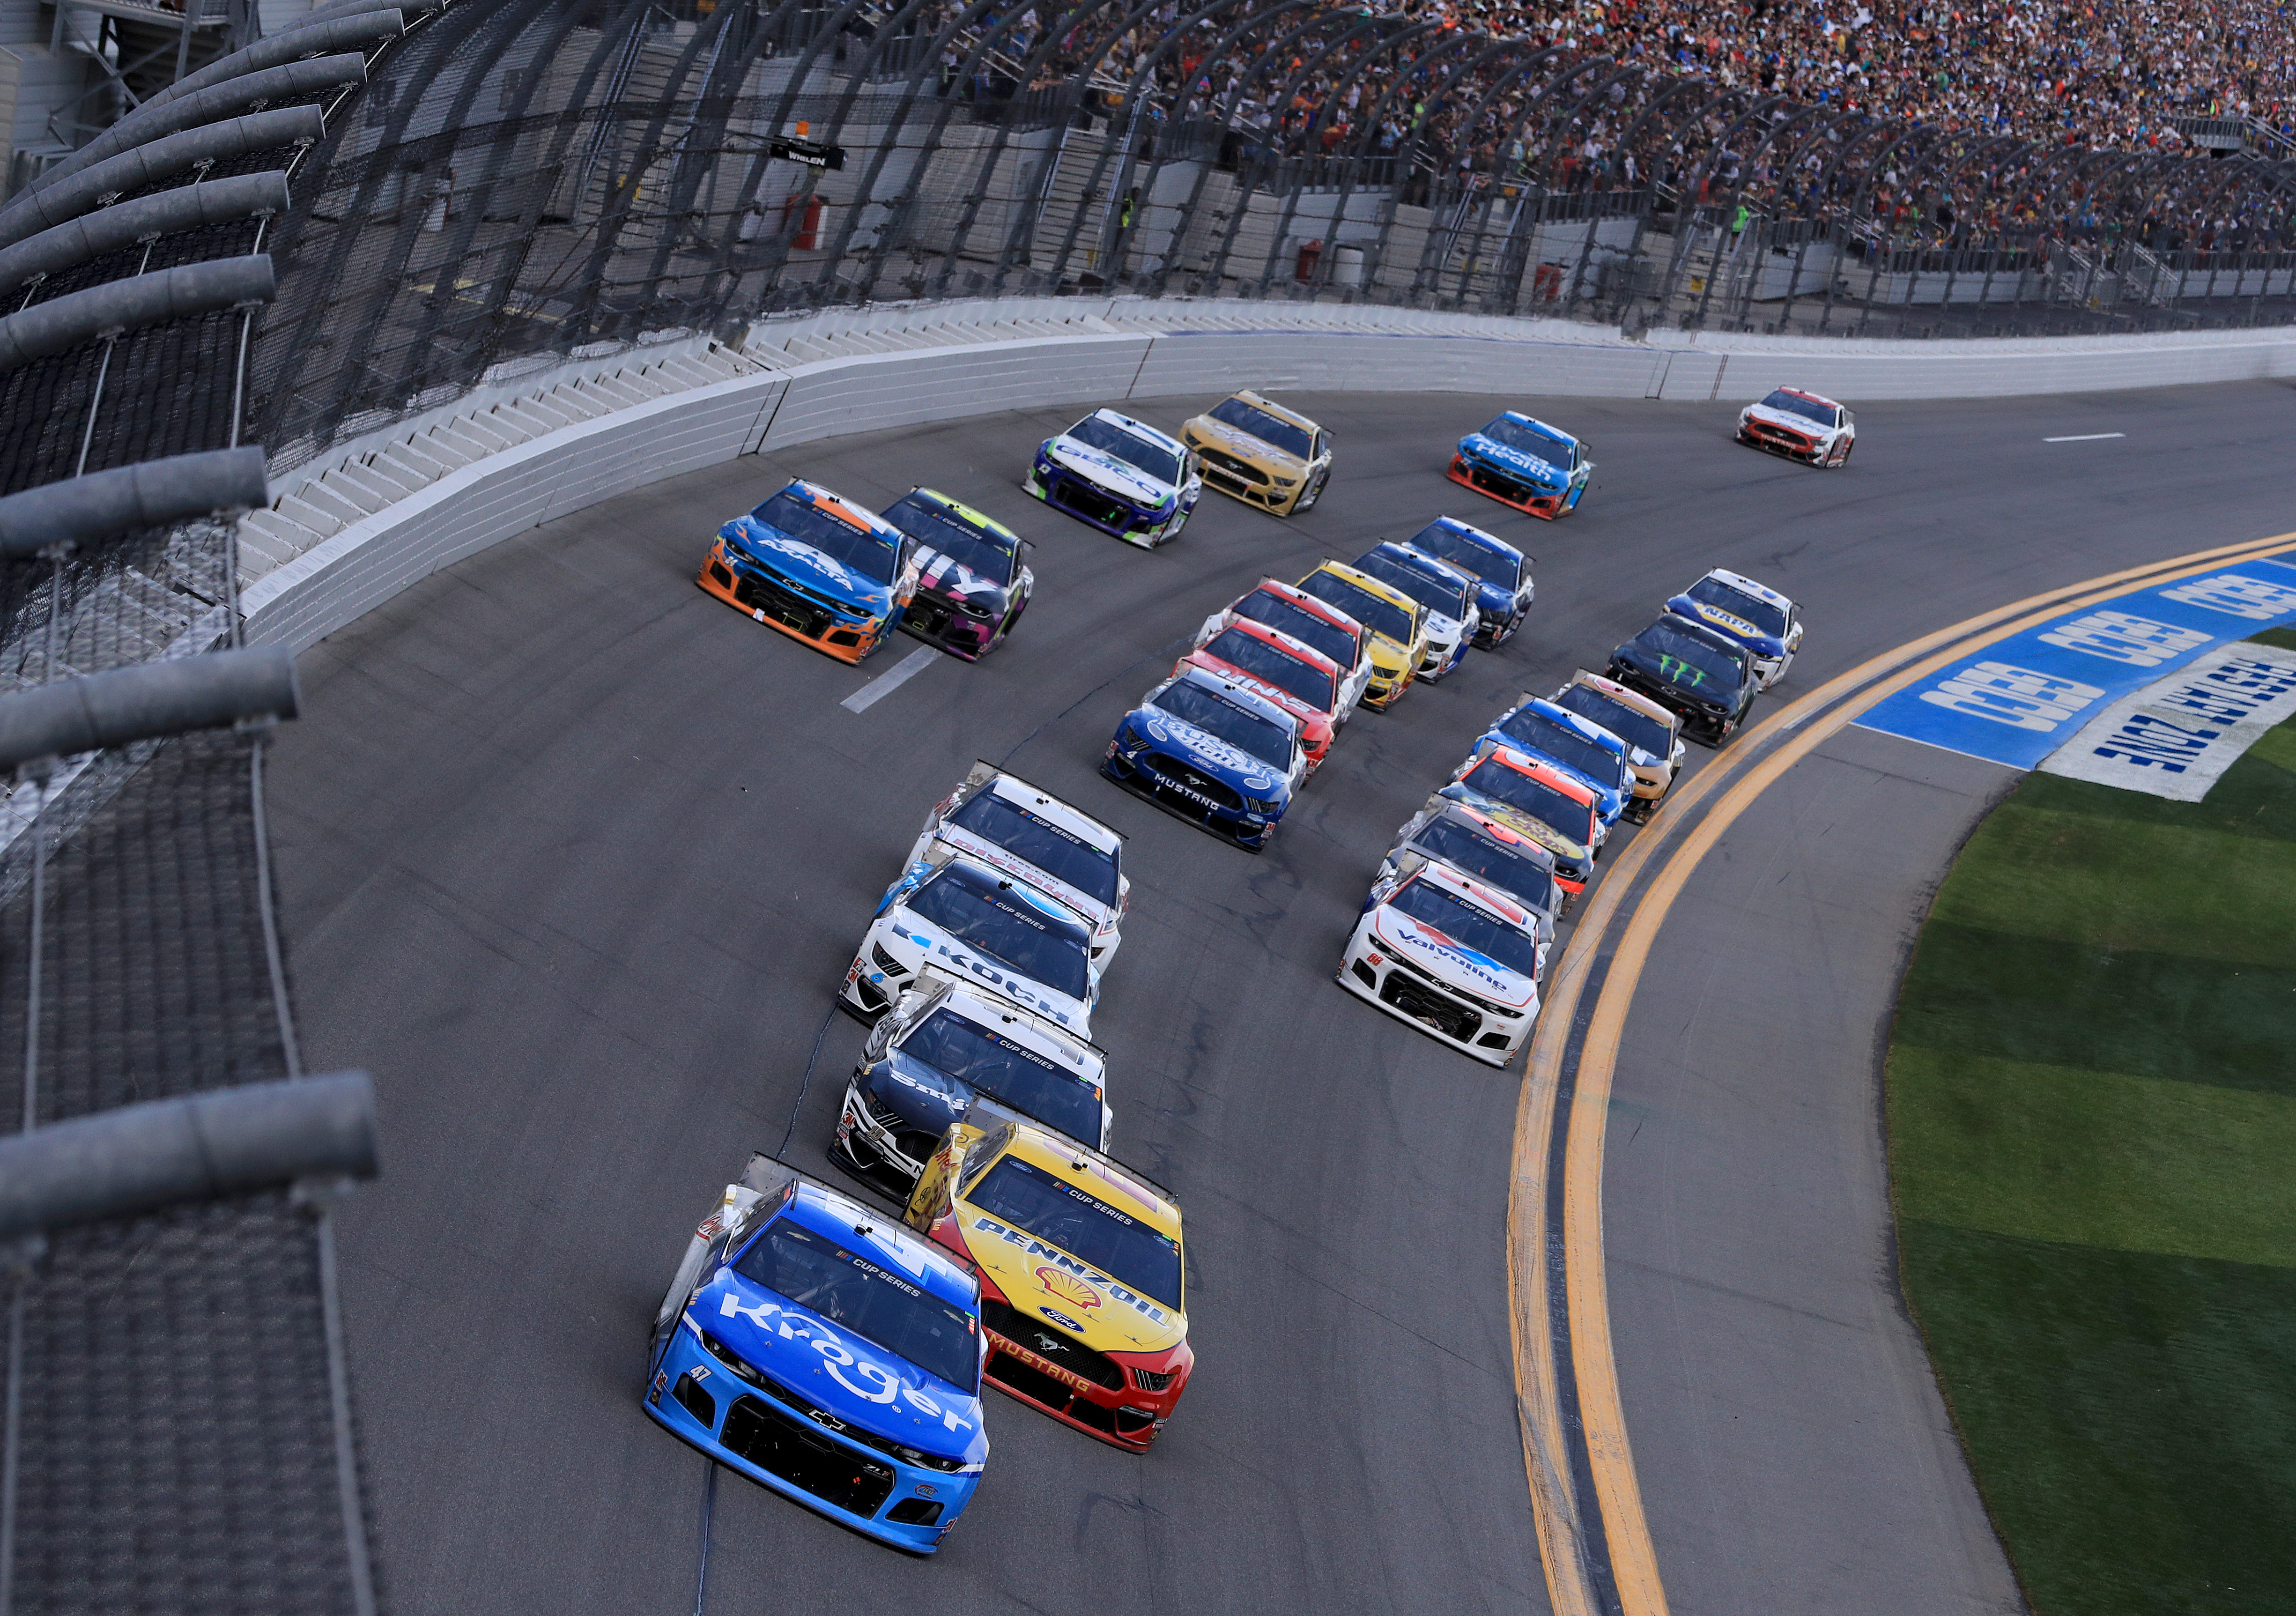 How Many Teams Will Show up for the Daytona 500?